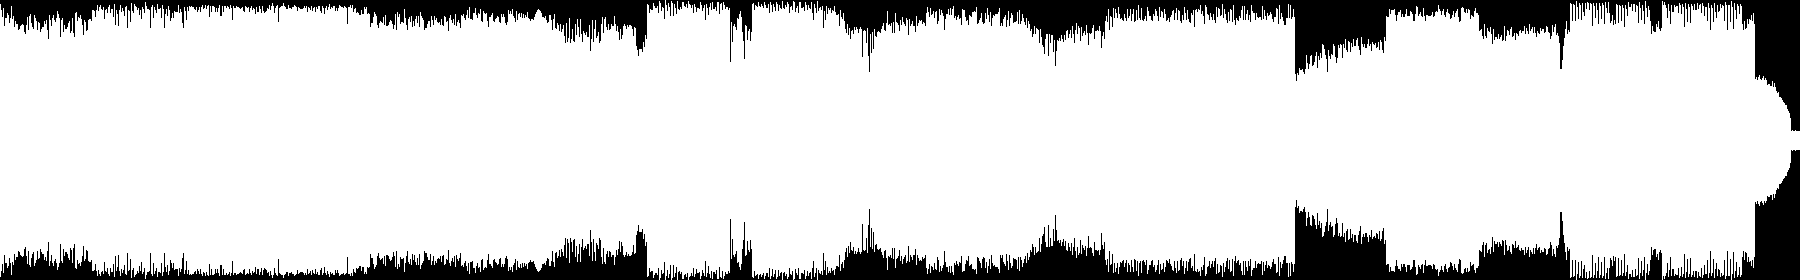 EDM 2018 audio waveform